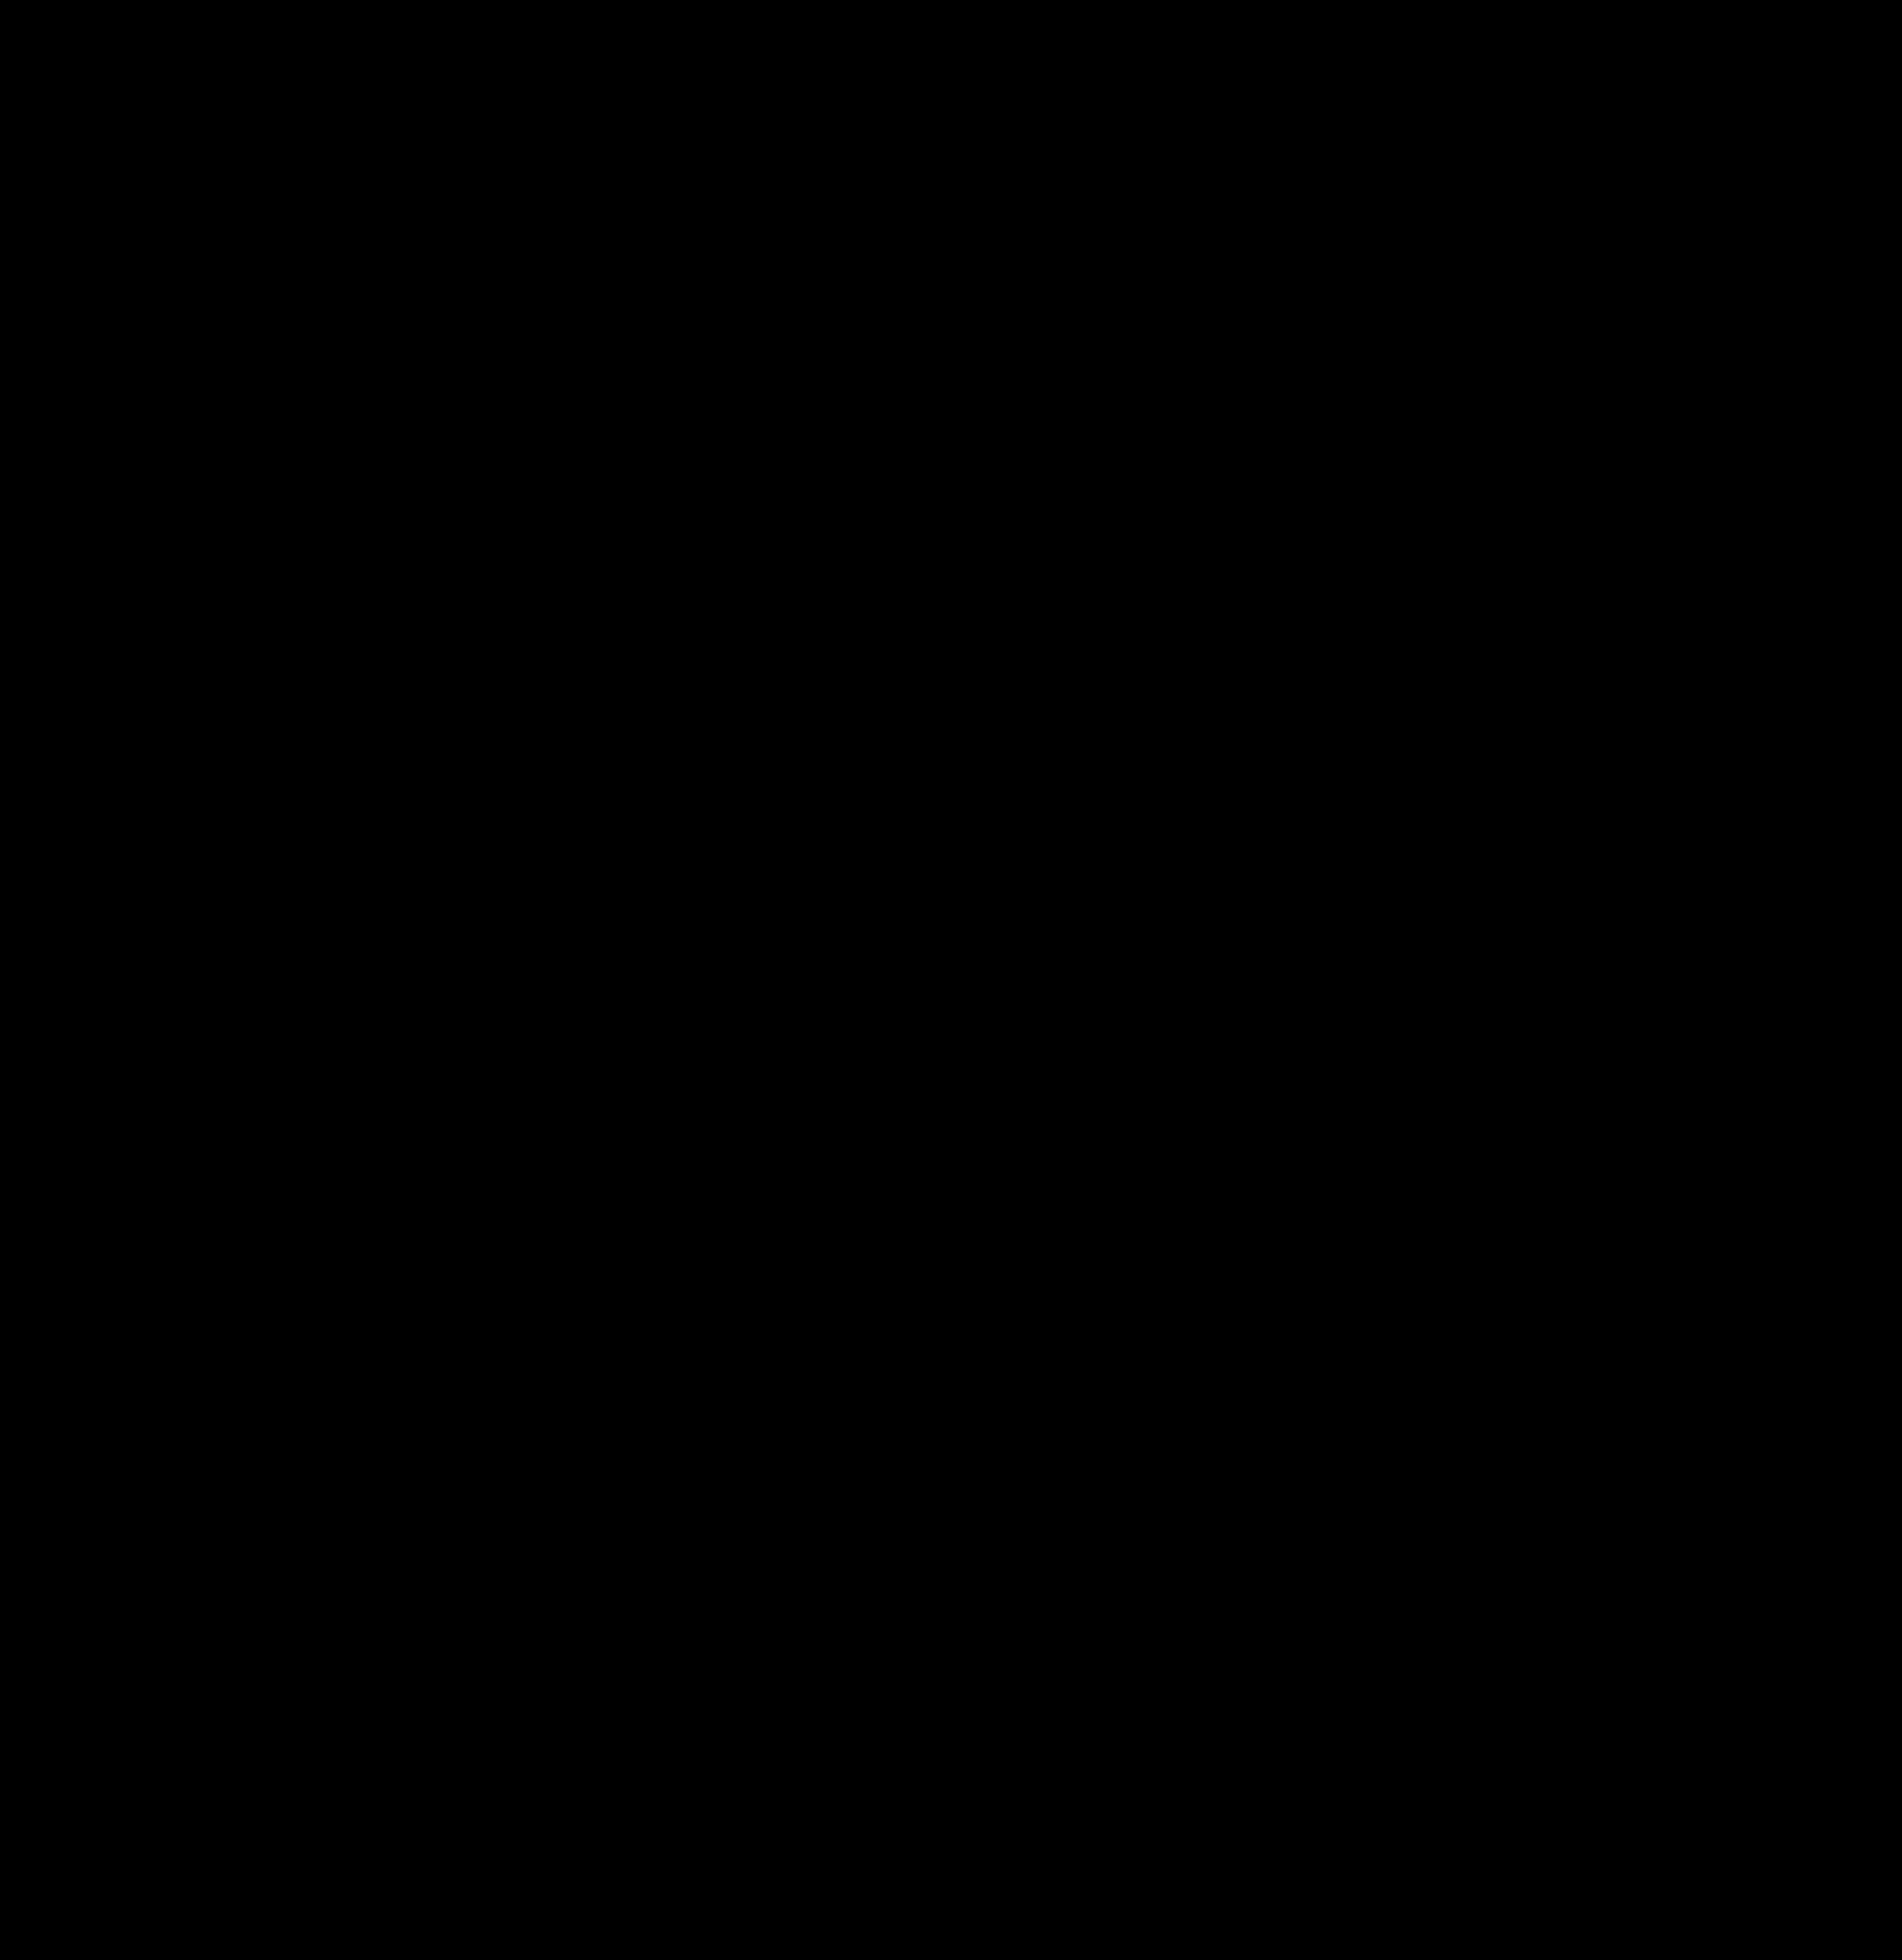 _-logo-black (1).png